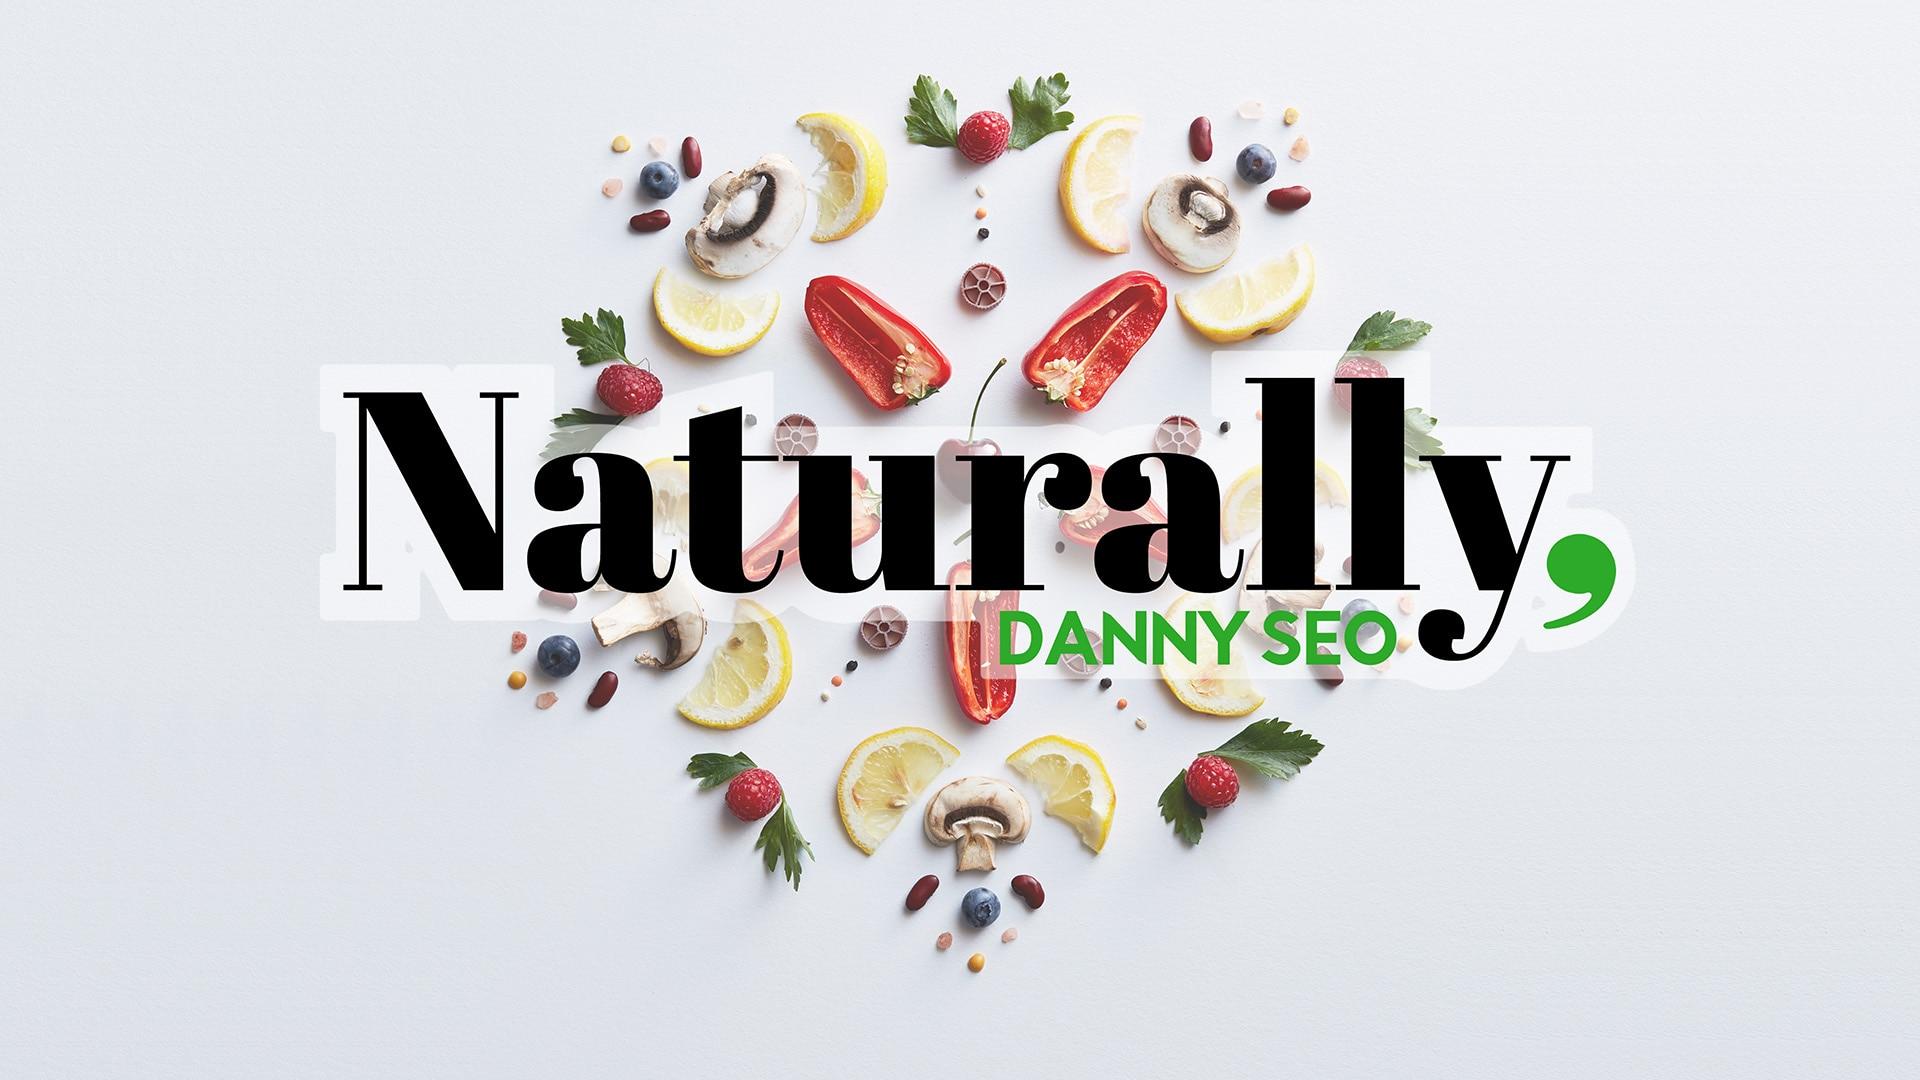 naturally danny seo nbc com